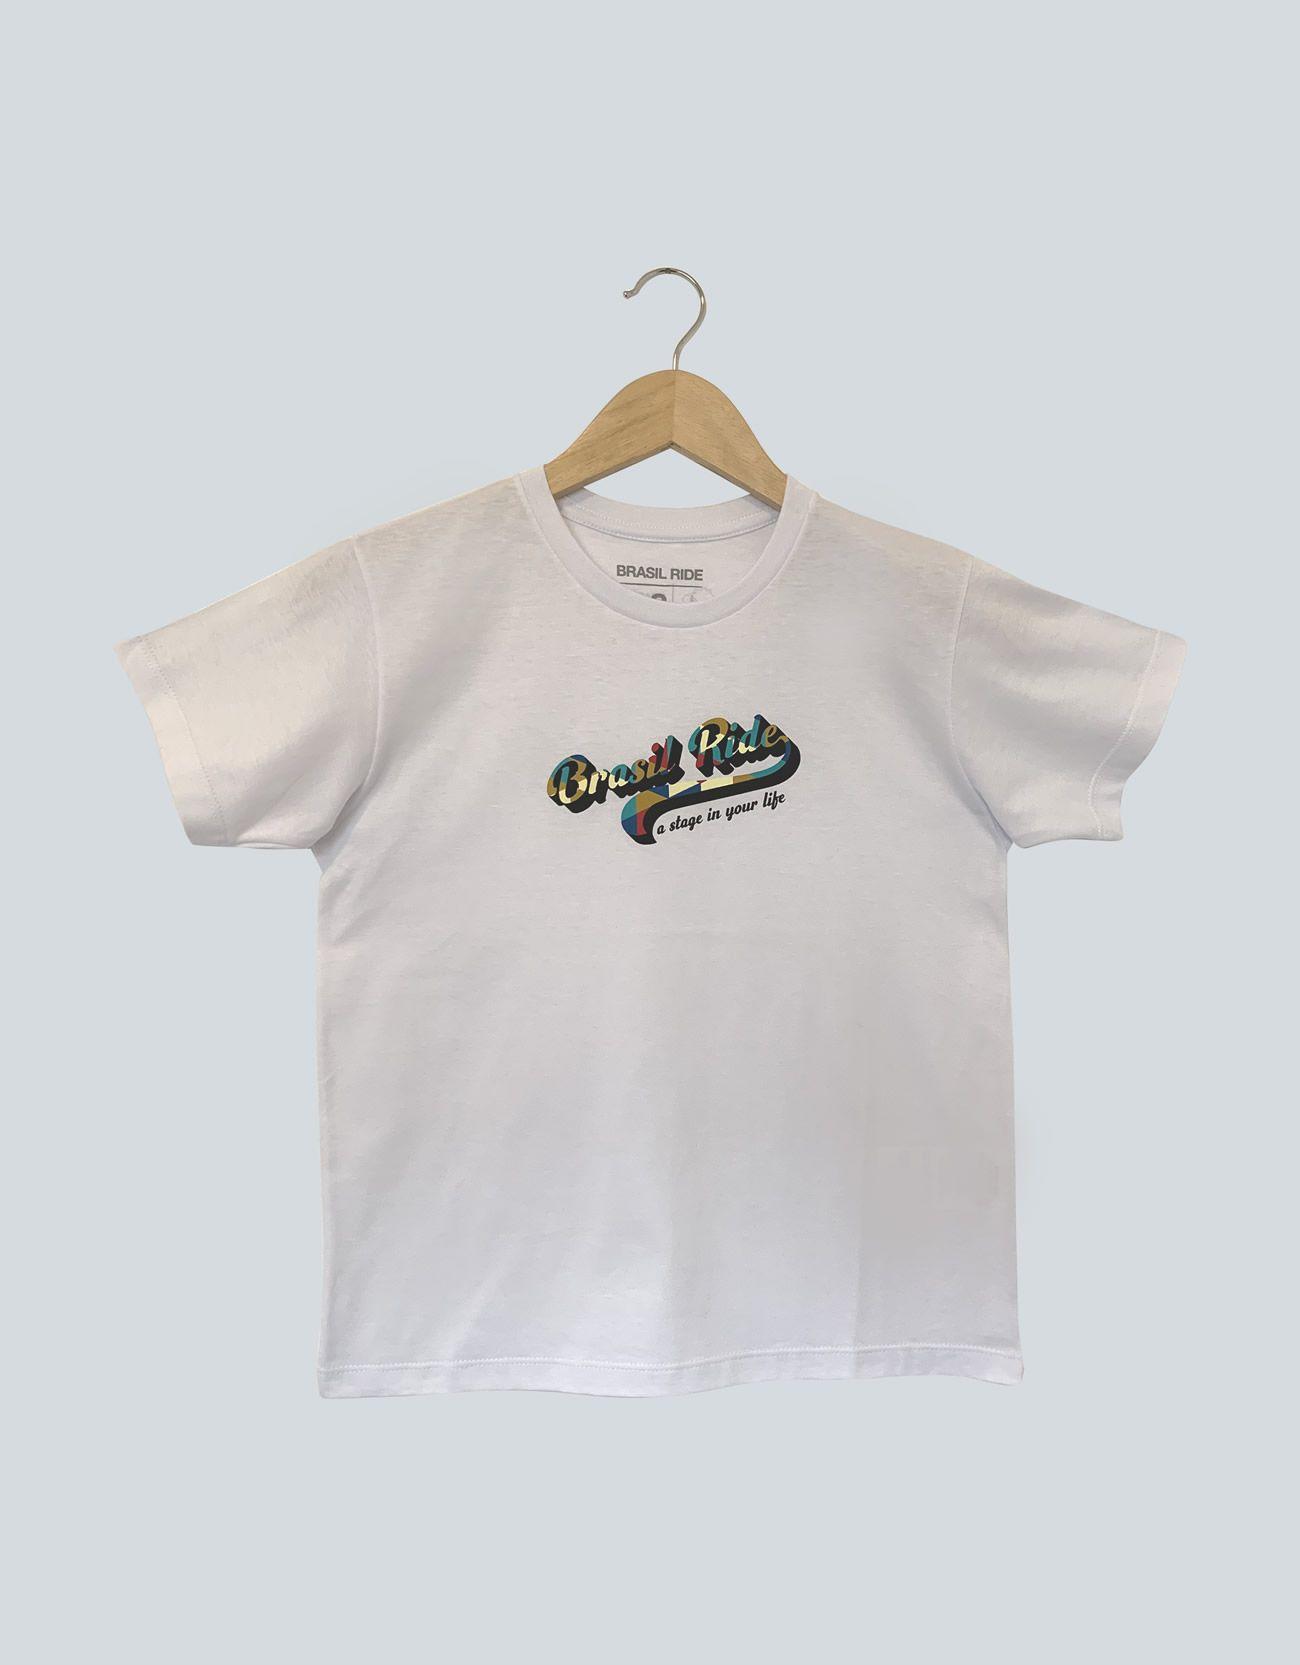 T-Shirt Infantil Brasil Ride